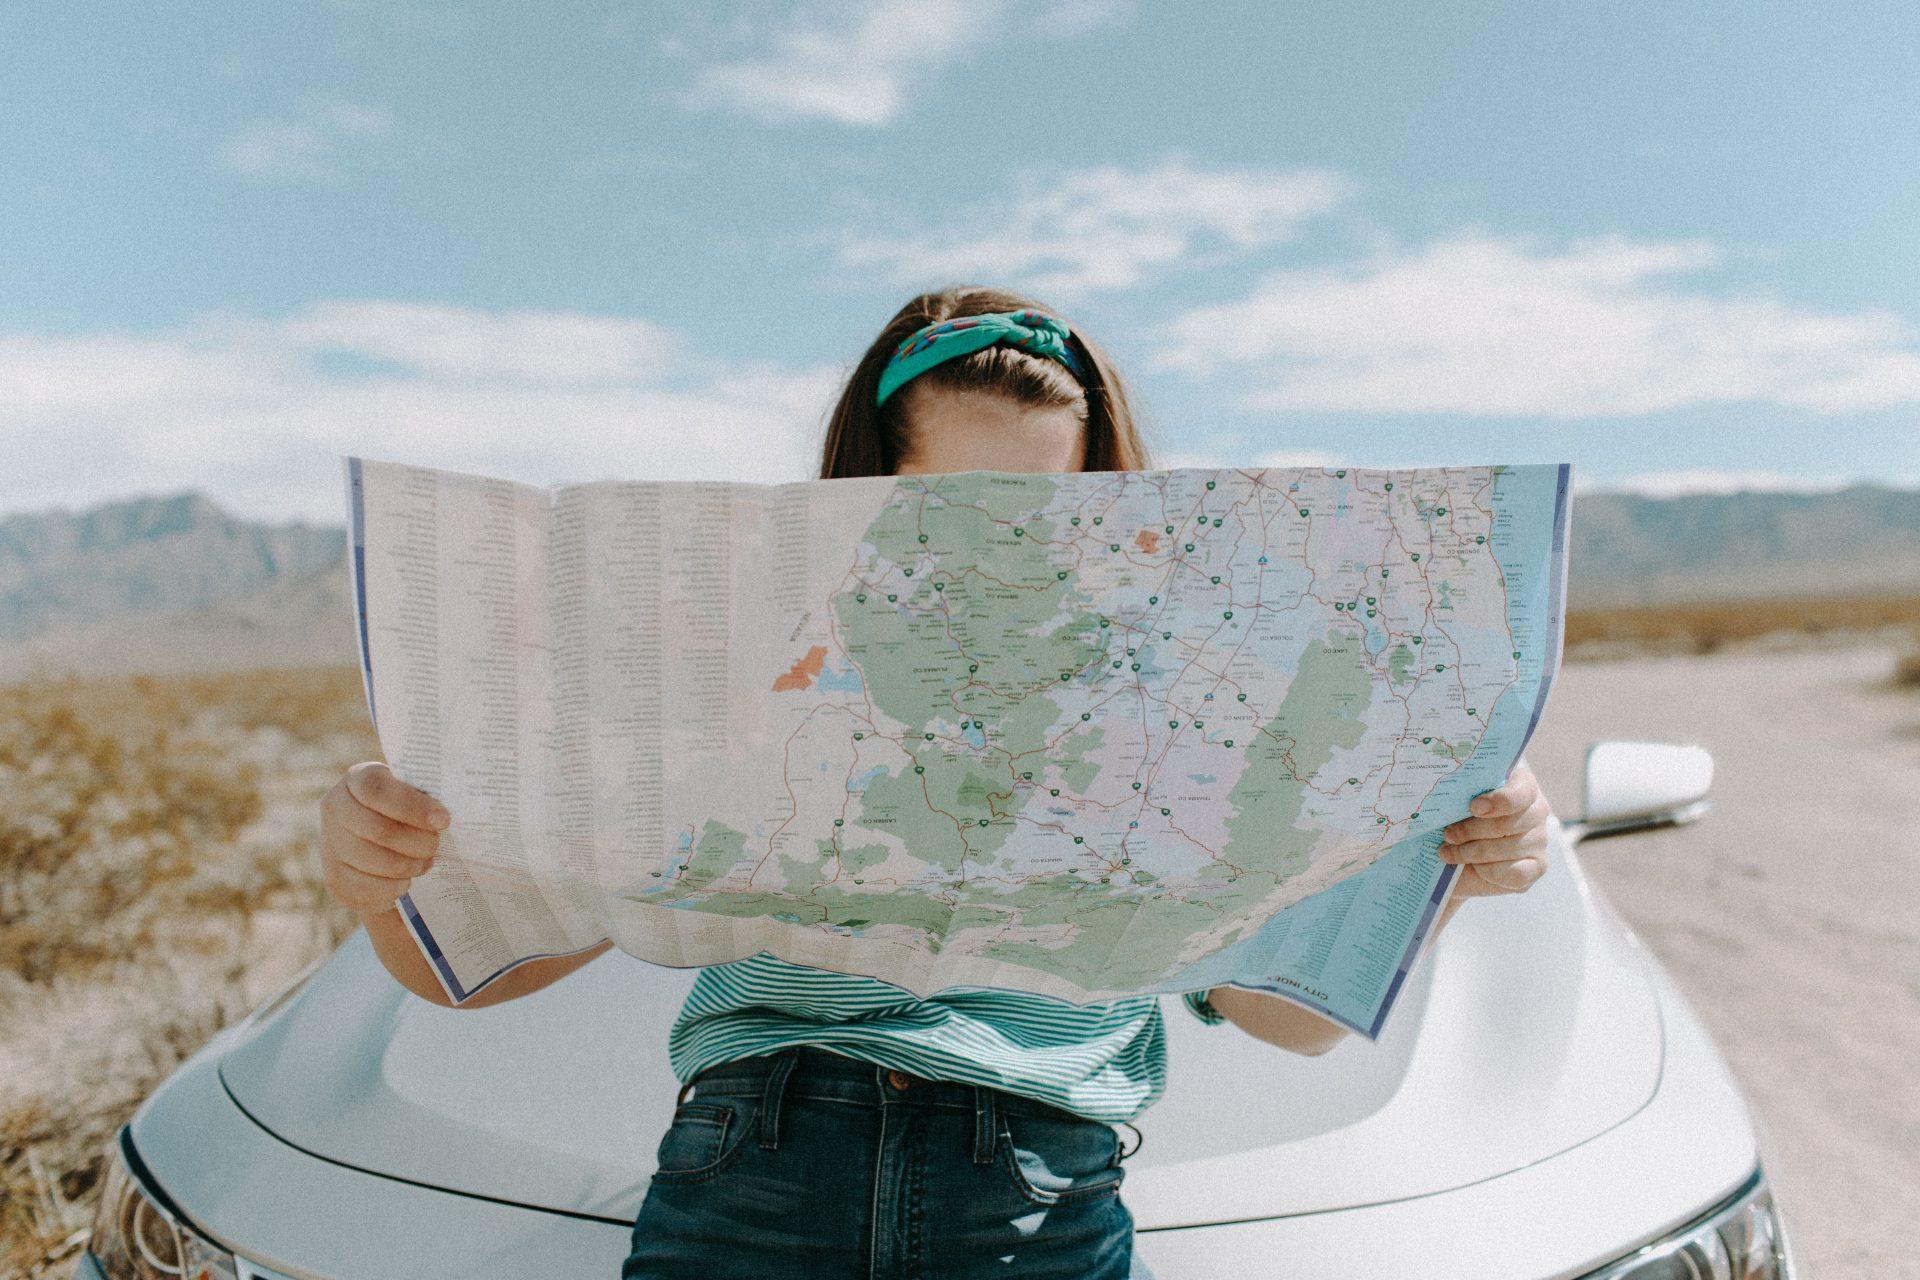 Frau mit Landkarte